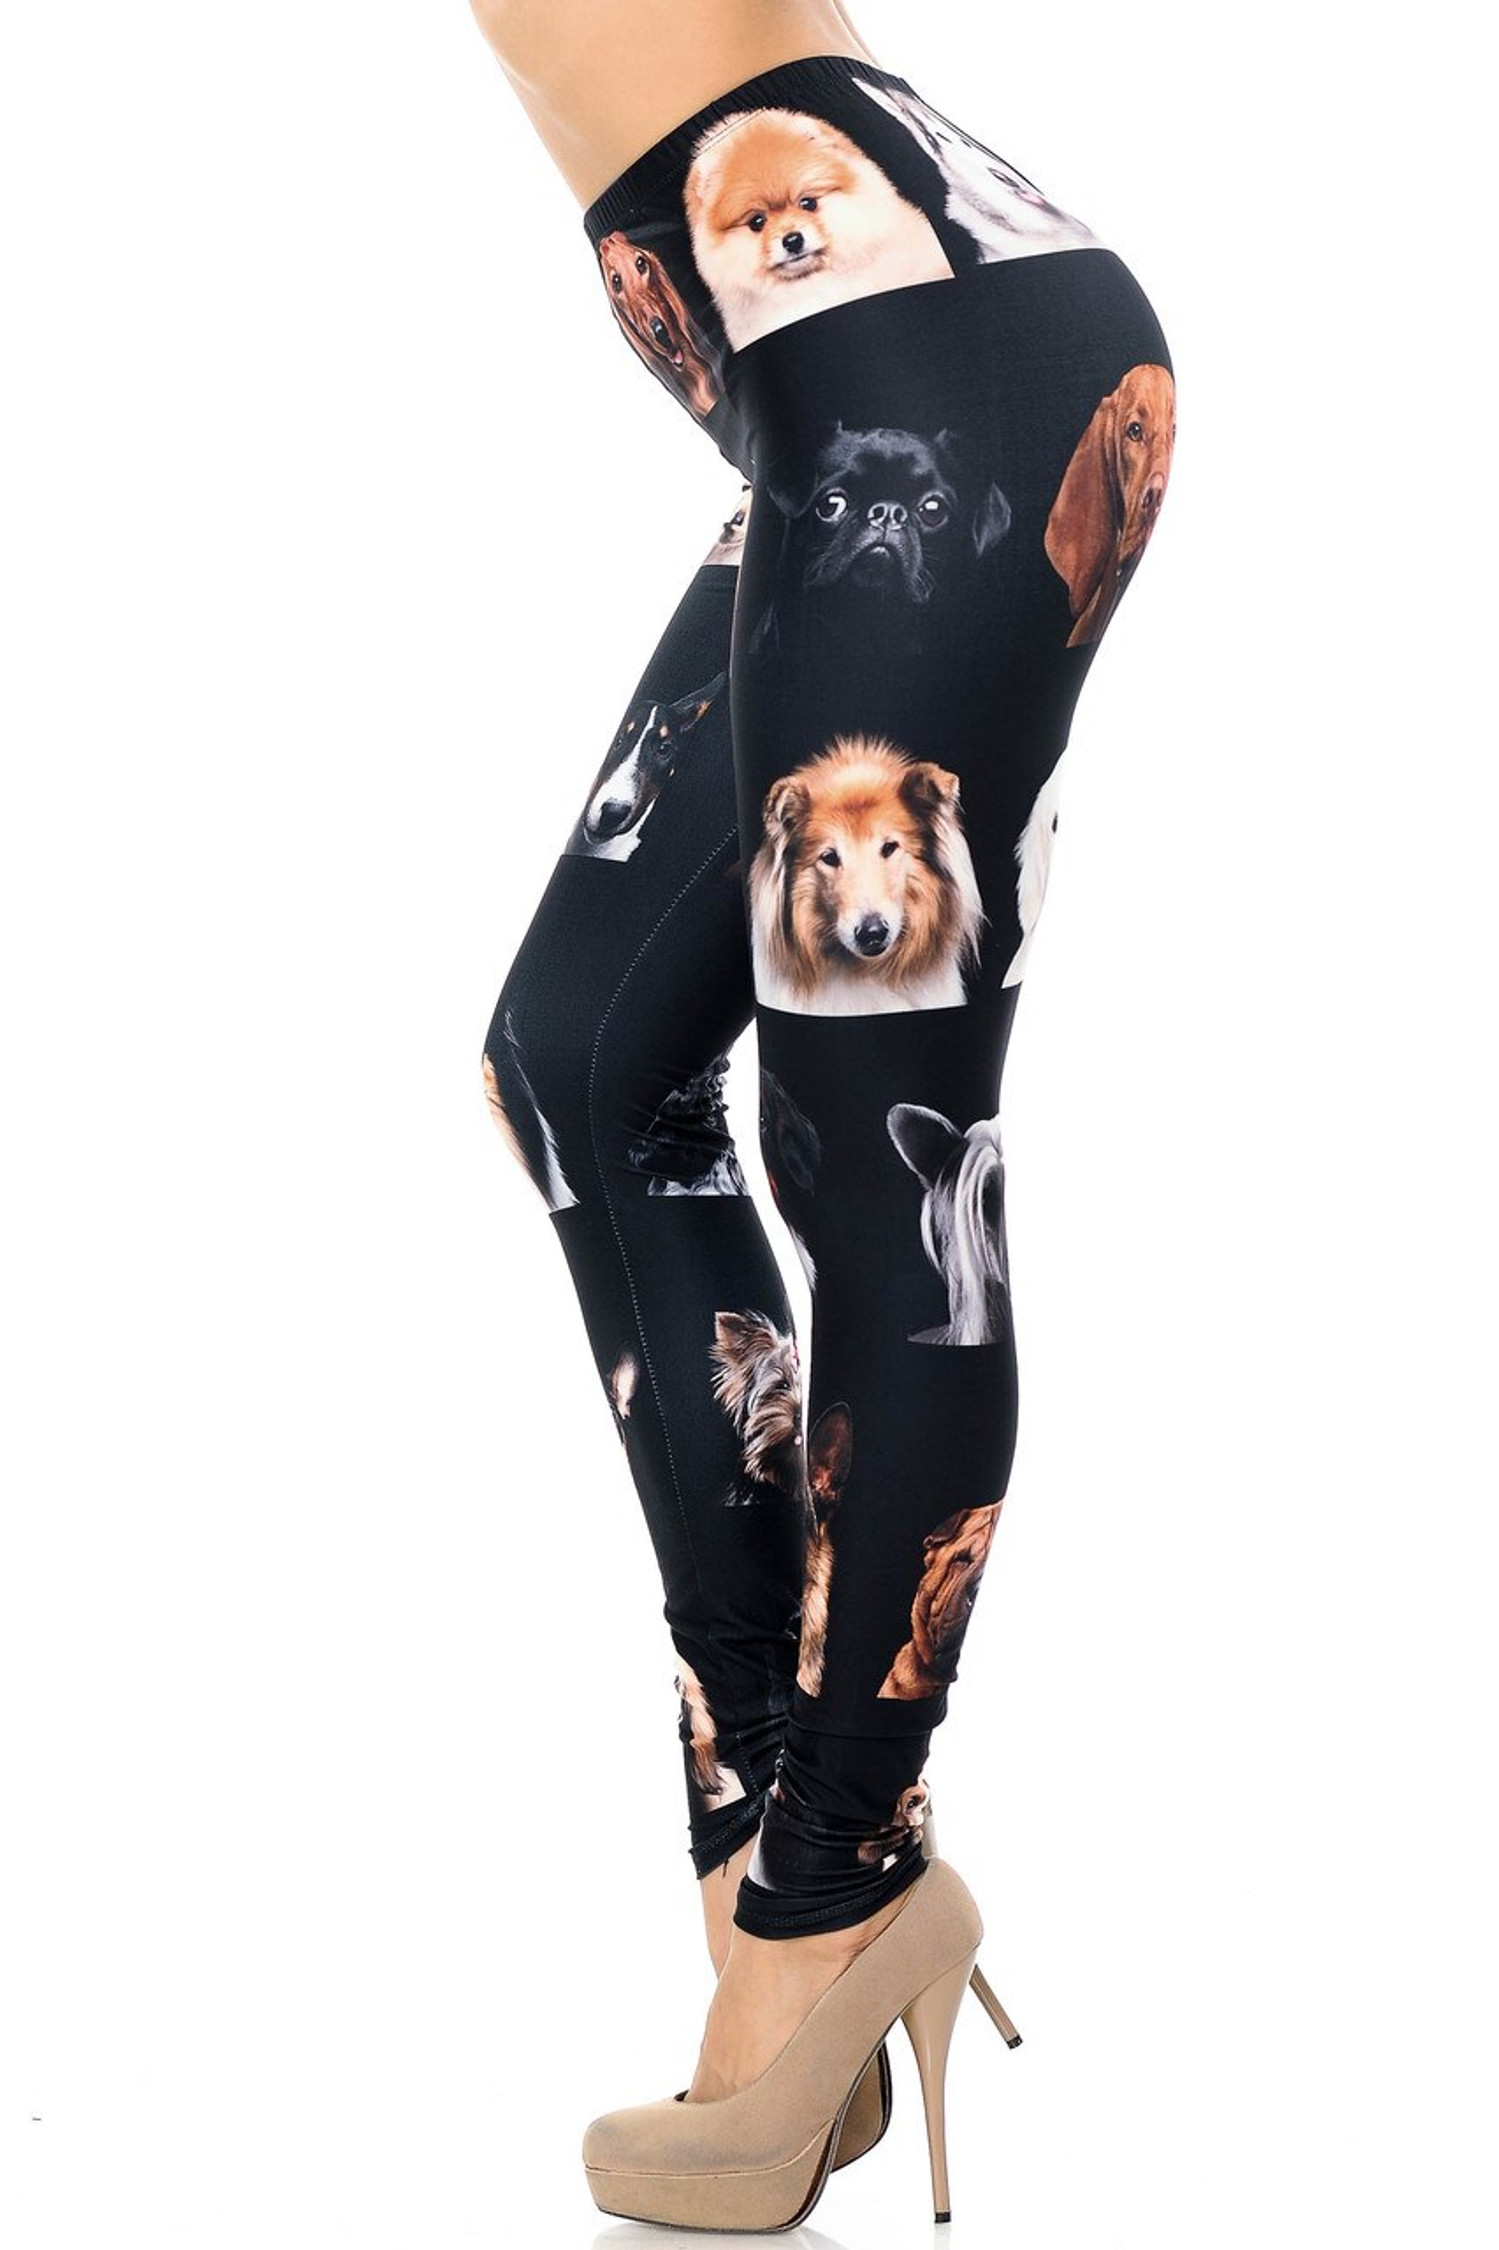 Creamy Soft Cute Puppy Dog Faces Leggings - Version 2 - USA Fashion™